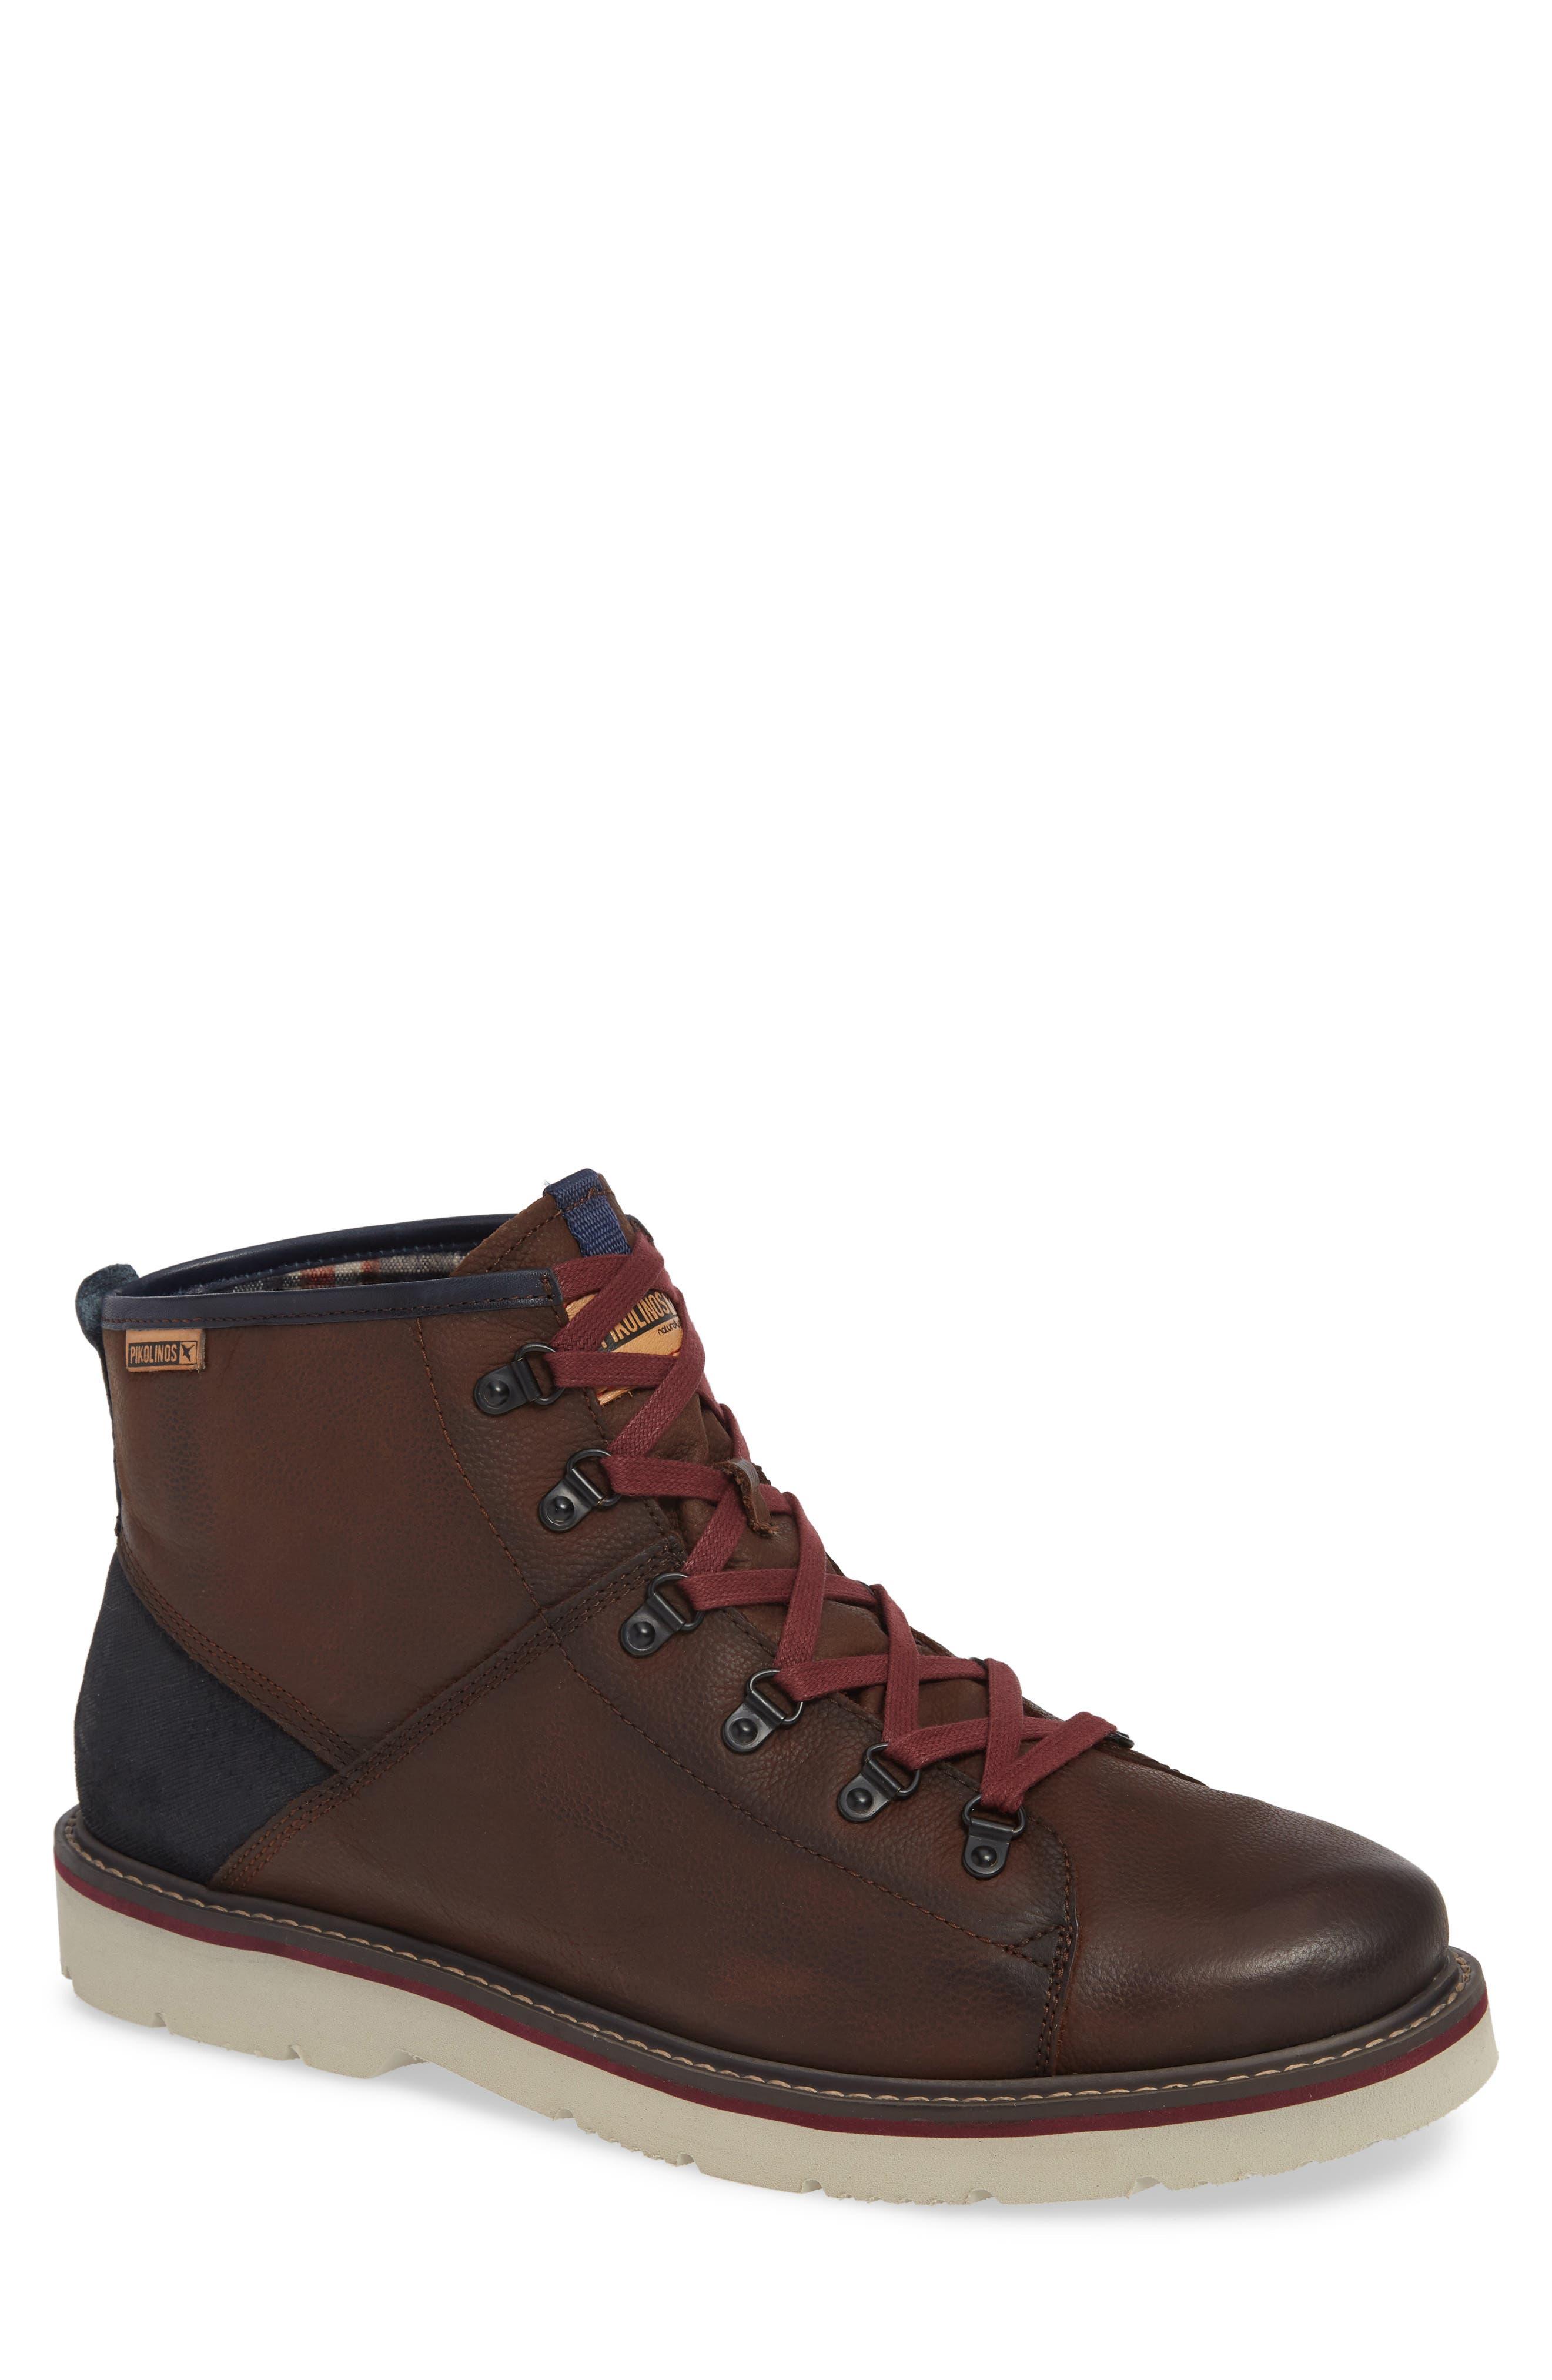 LLeida Plain Toe Boot,                         Main,                         color, 617